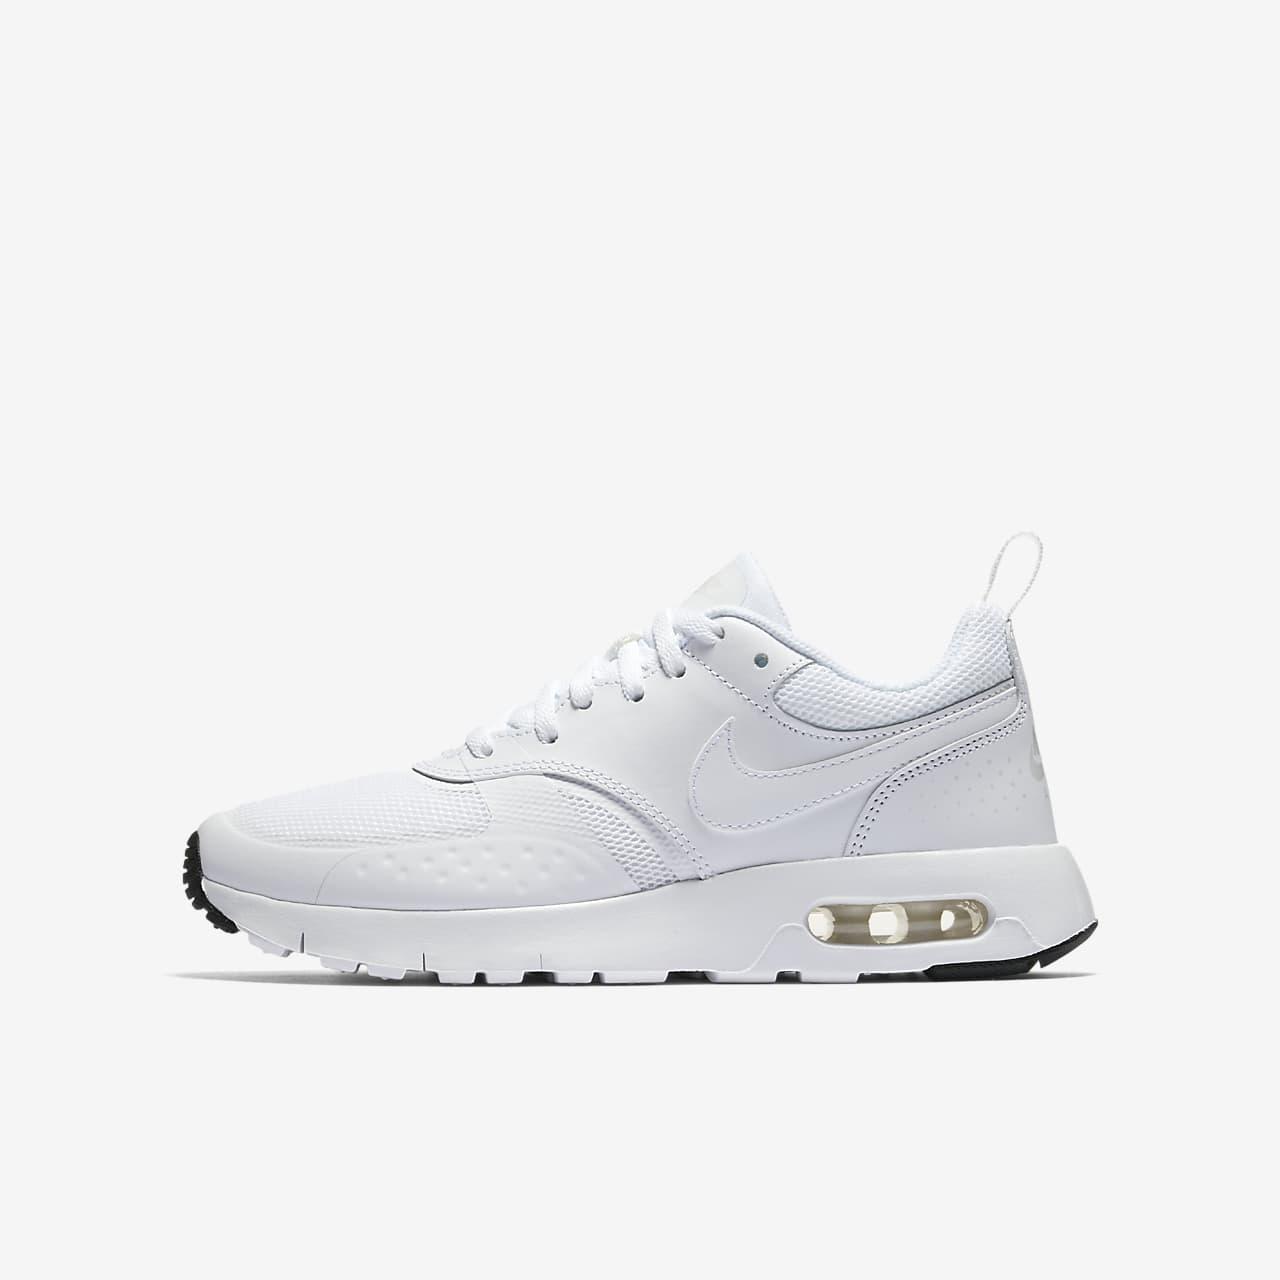 Nike Air Max Vision Genç Çocuk Ayakkabısı